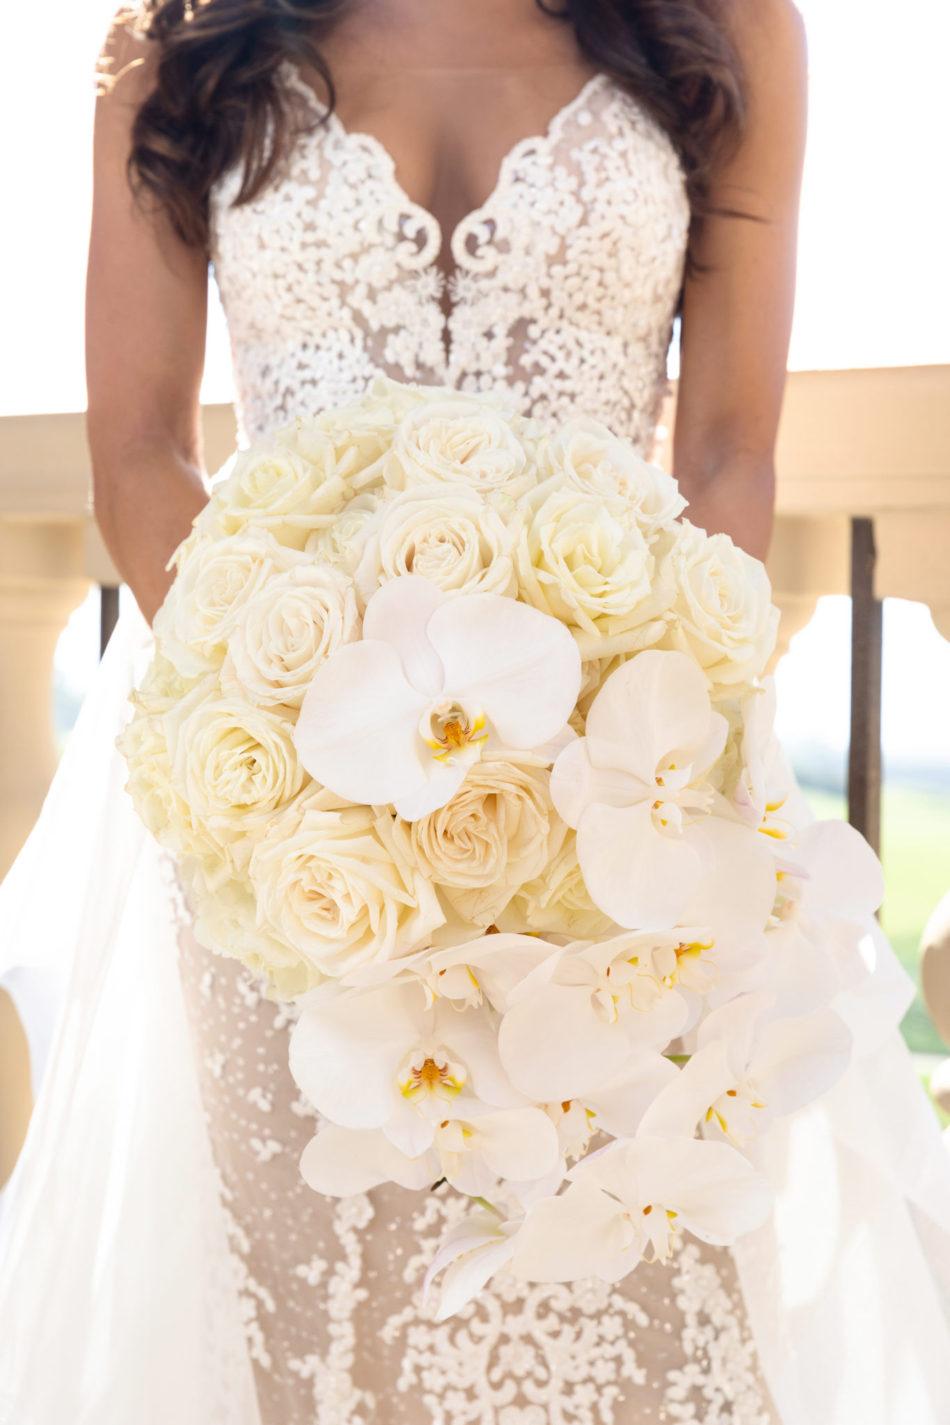 floral design, florist, wedding florist, wedding flowers, orange county weddings, orange county wedding florist, orange county florist, orange county floral design, flowers by cina